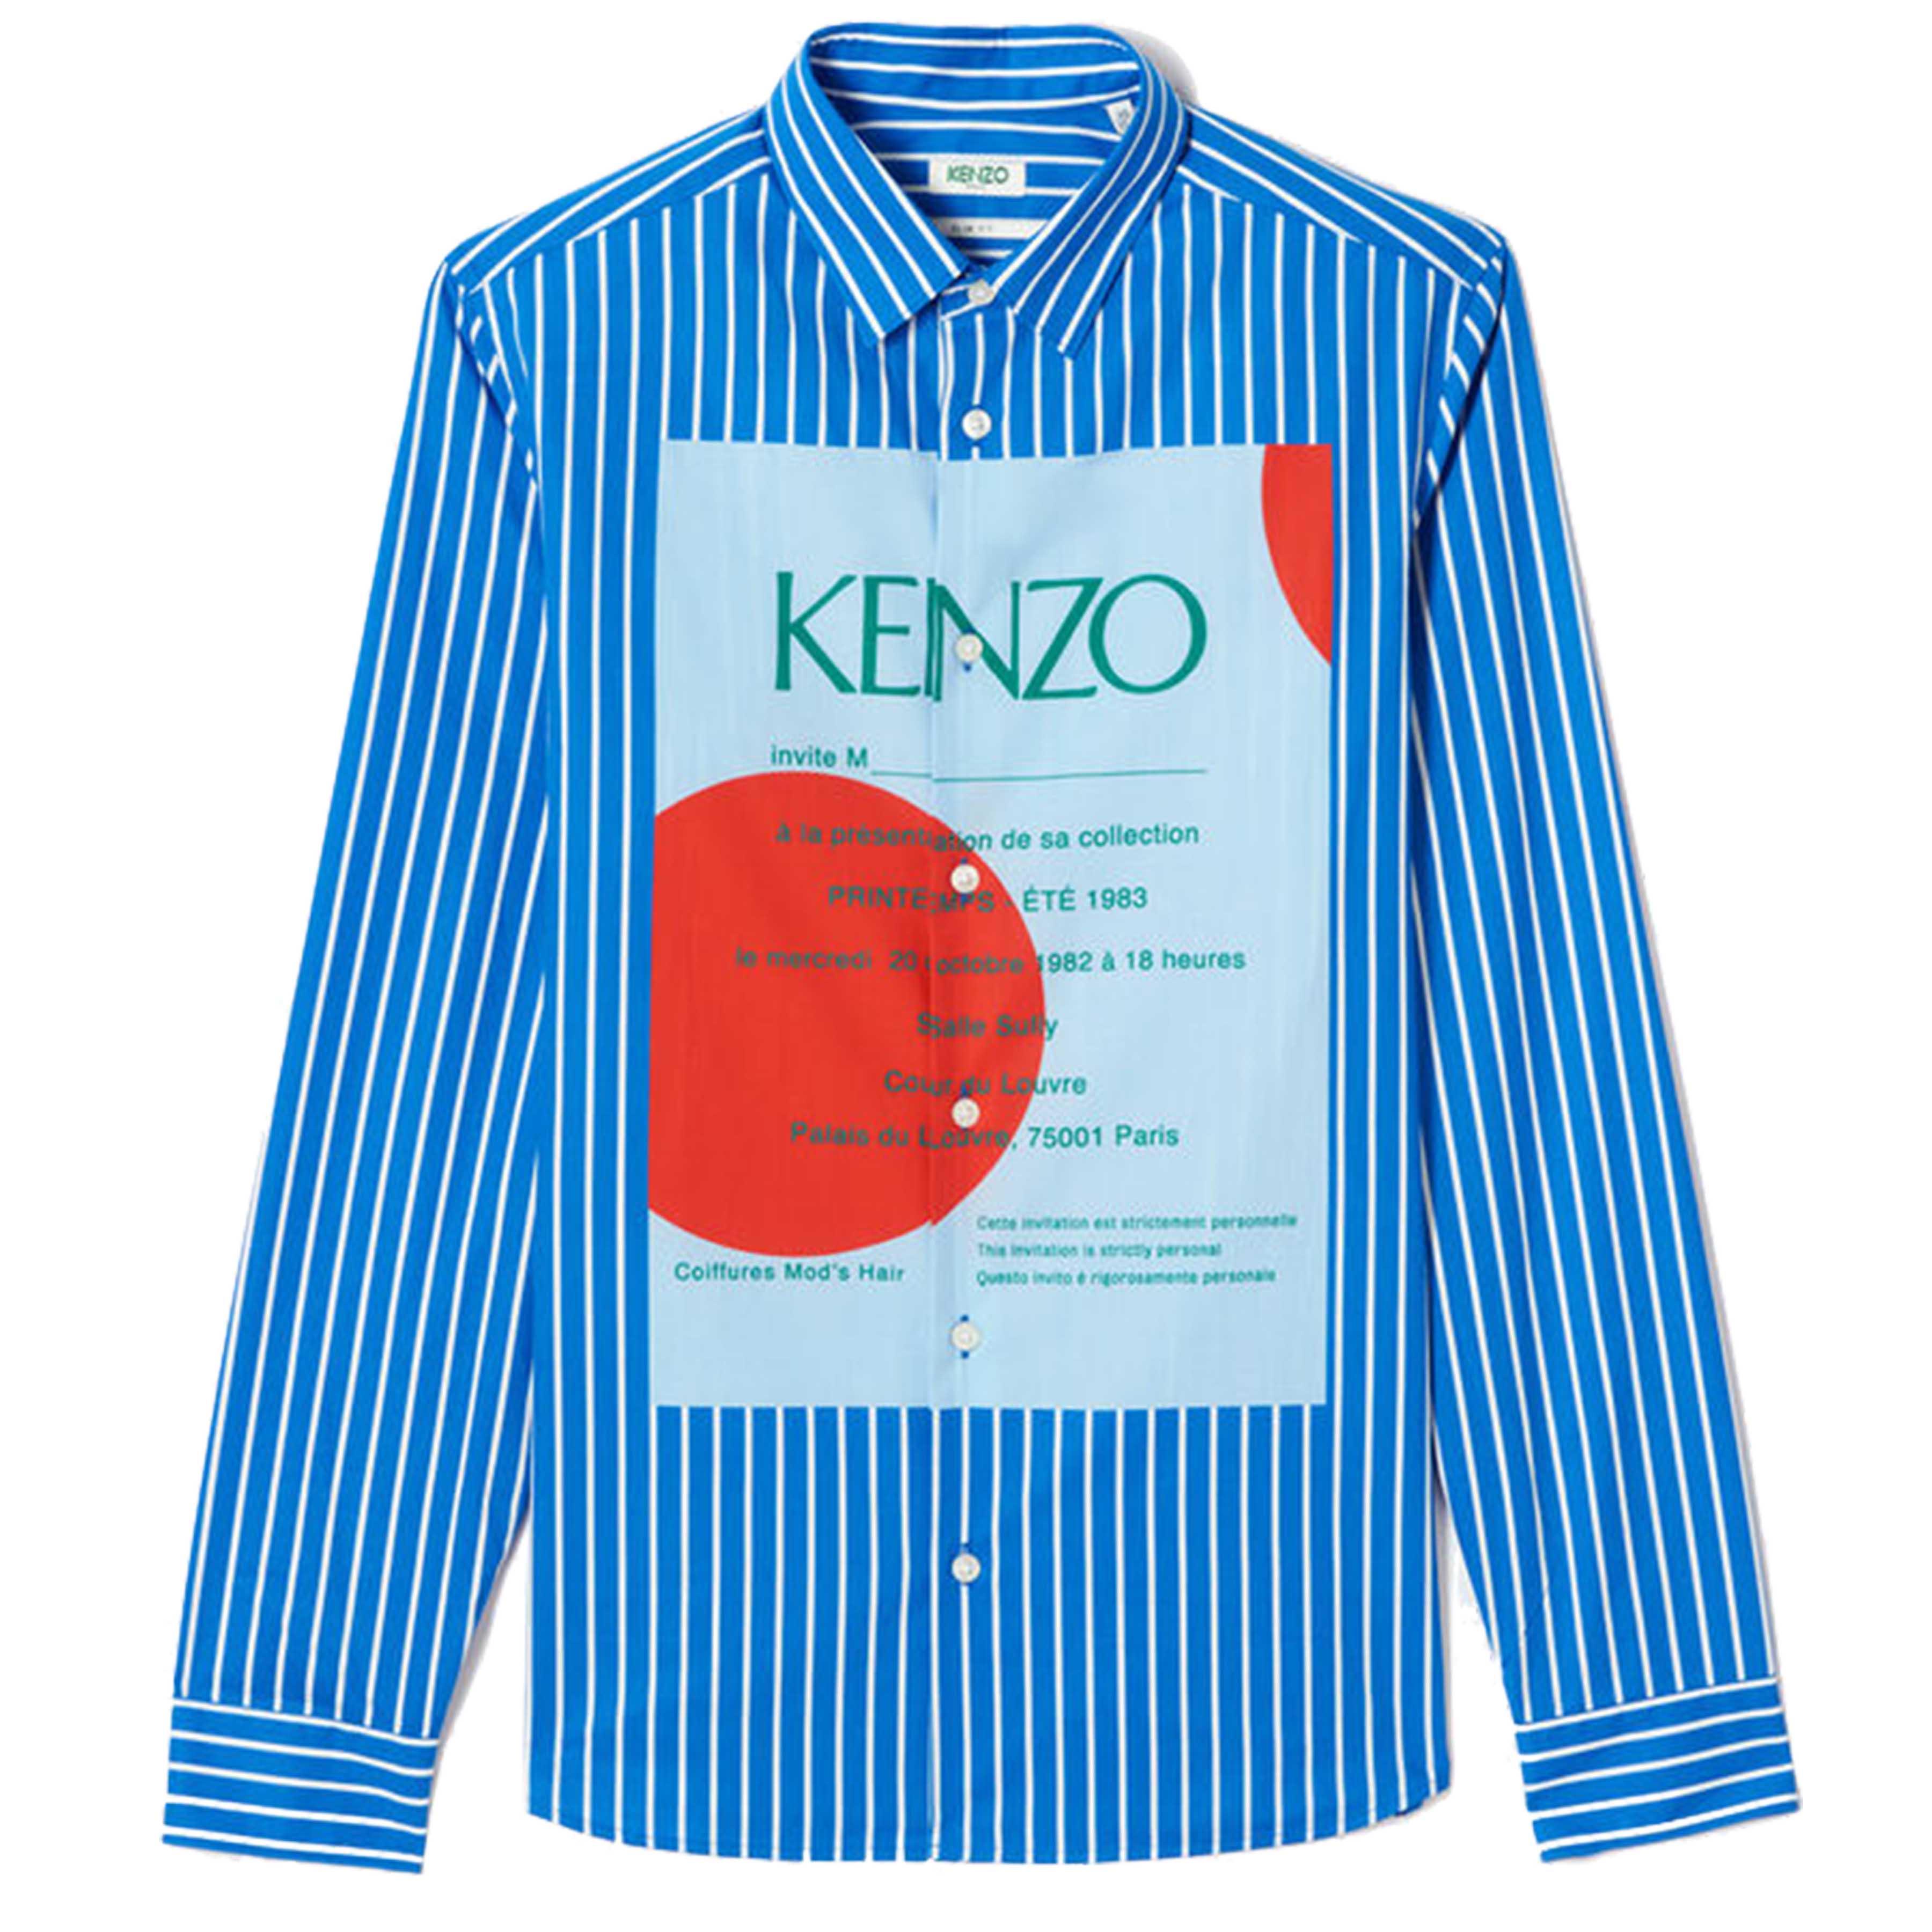 SS19 Printed Shirts: KENZO